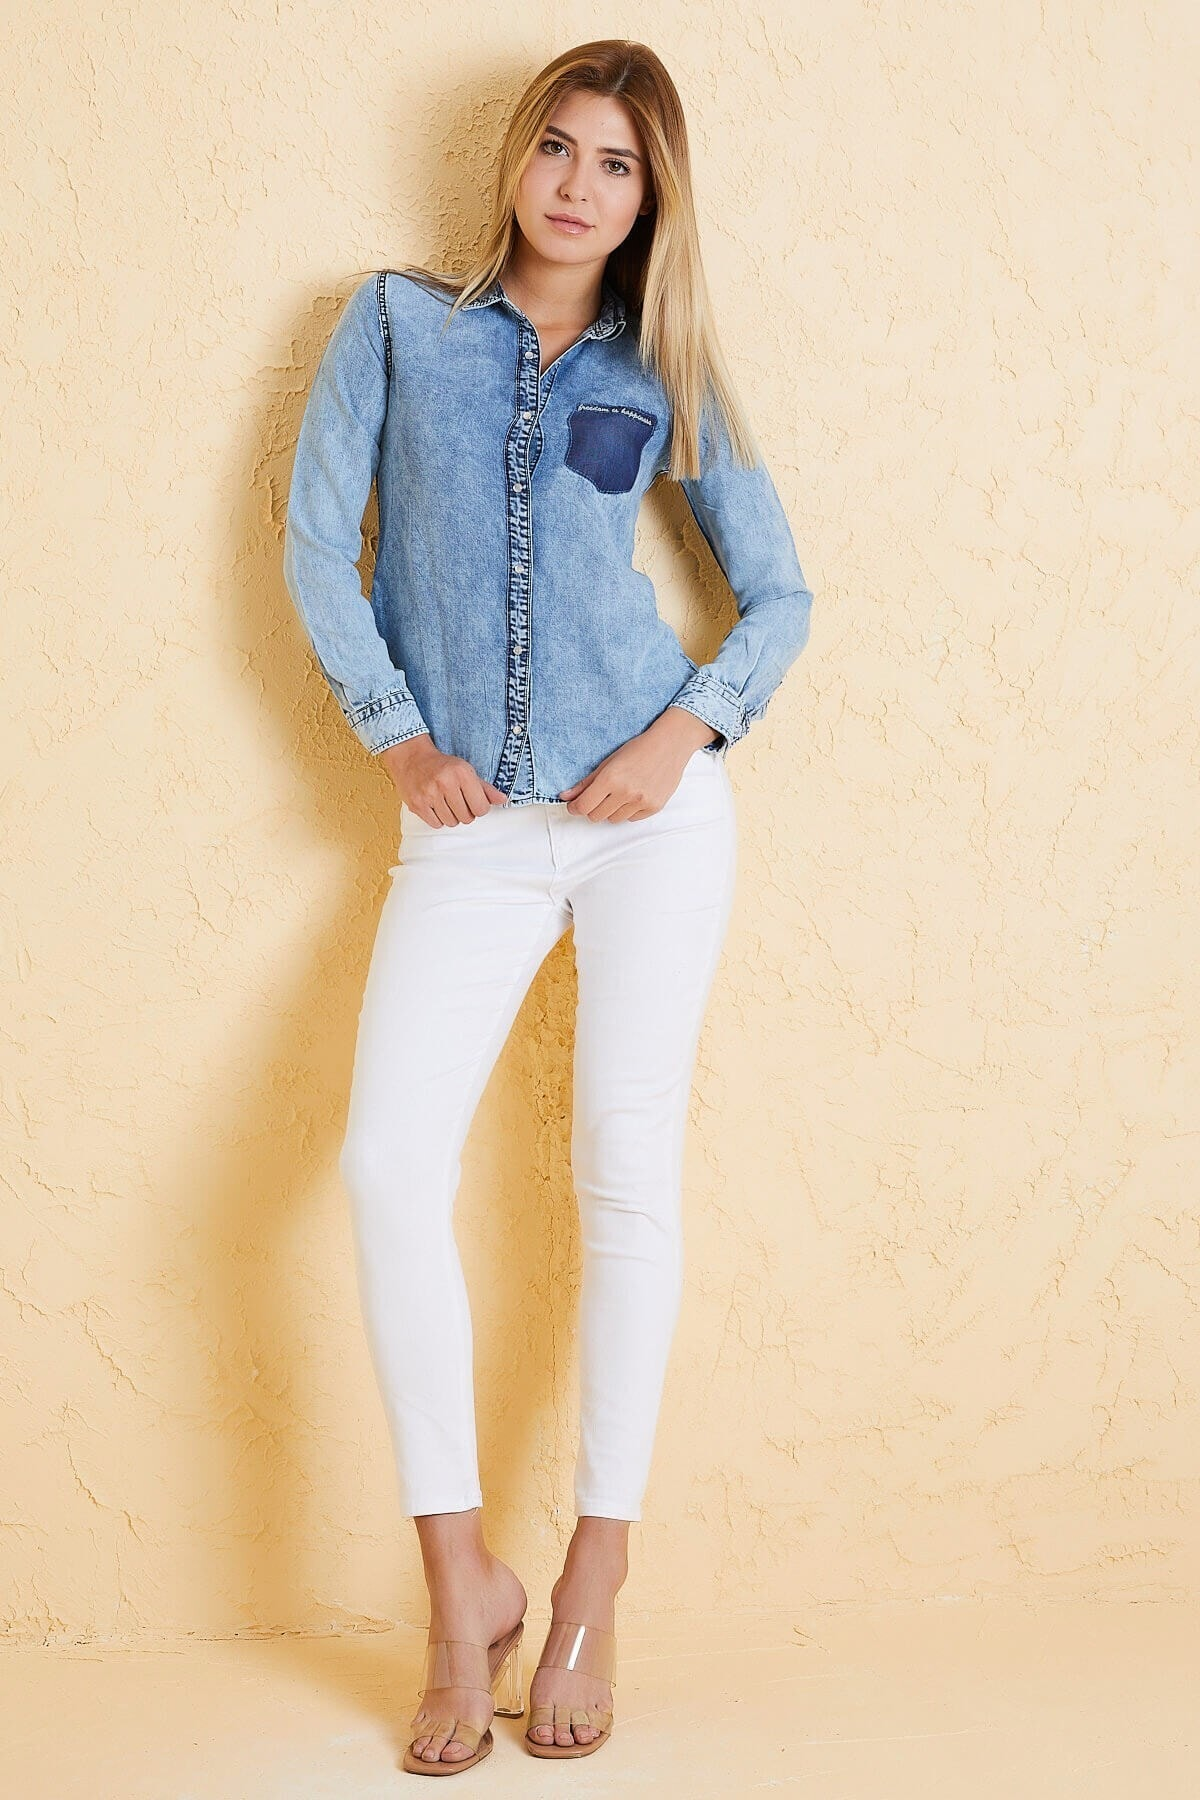 Twister Jeans Twıster Jeans Bg 810-02 Kadın Kot Gömlek Mavi 2